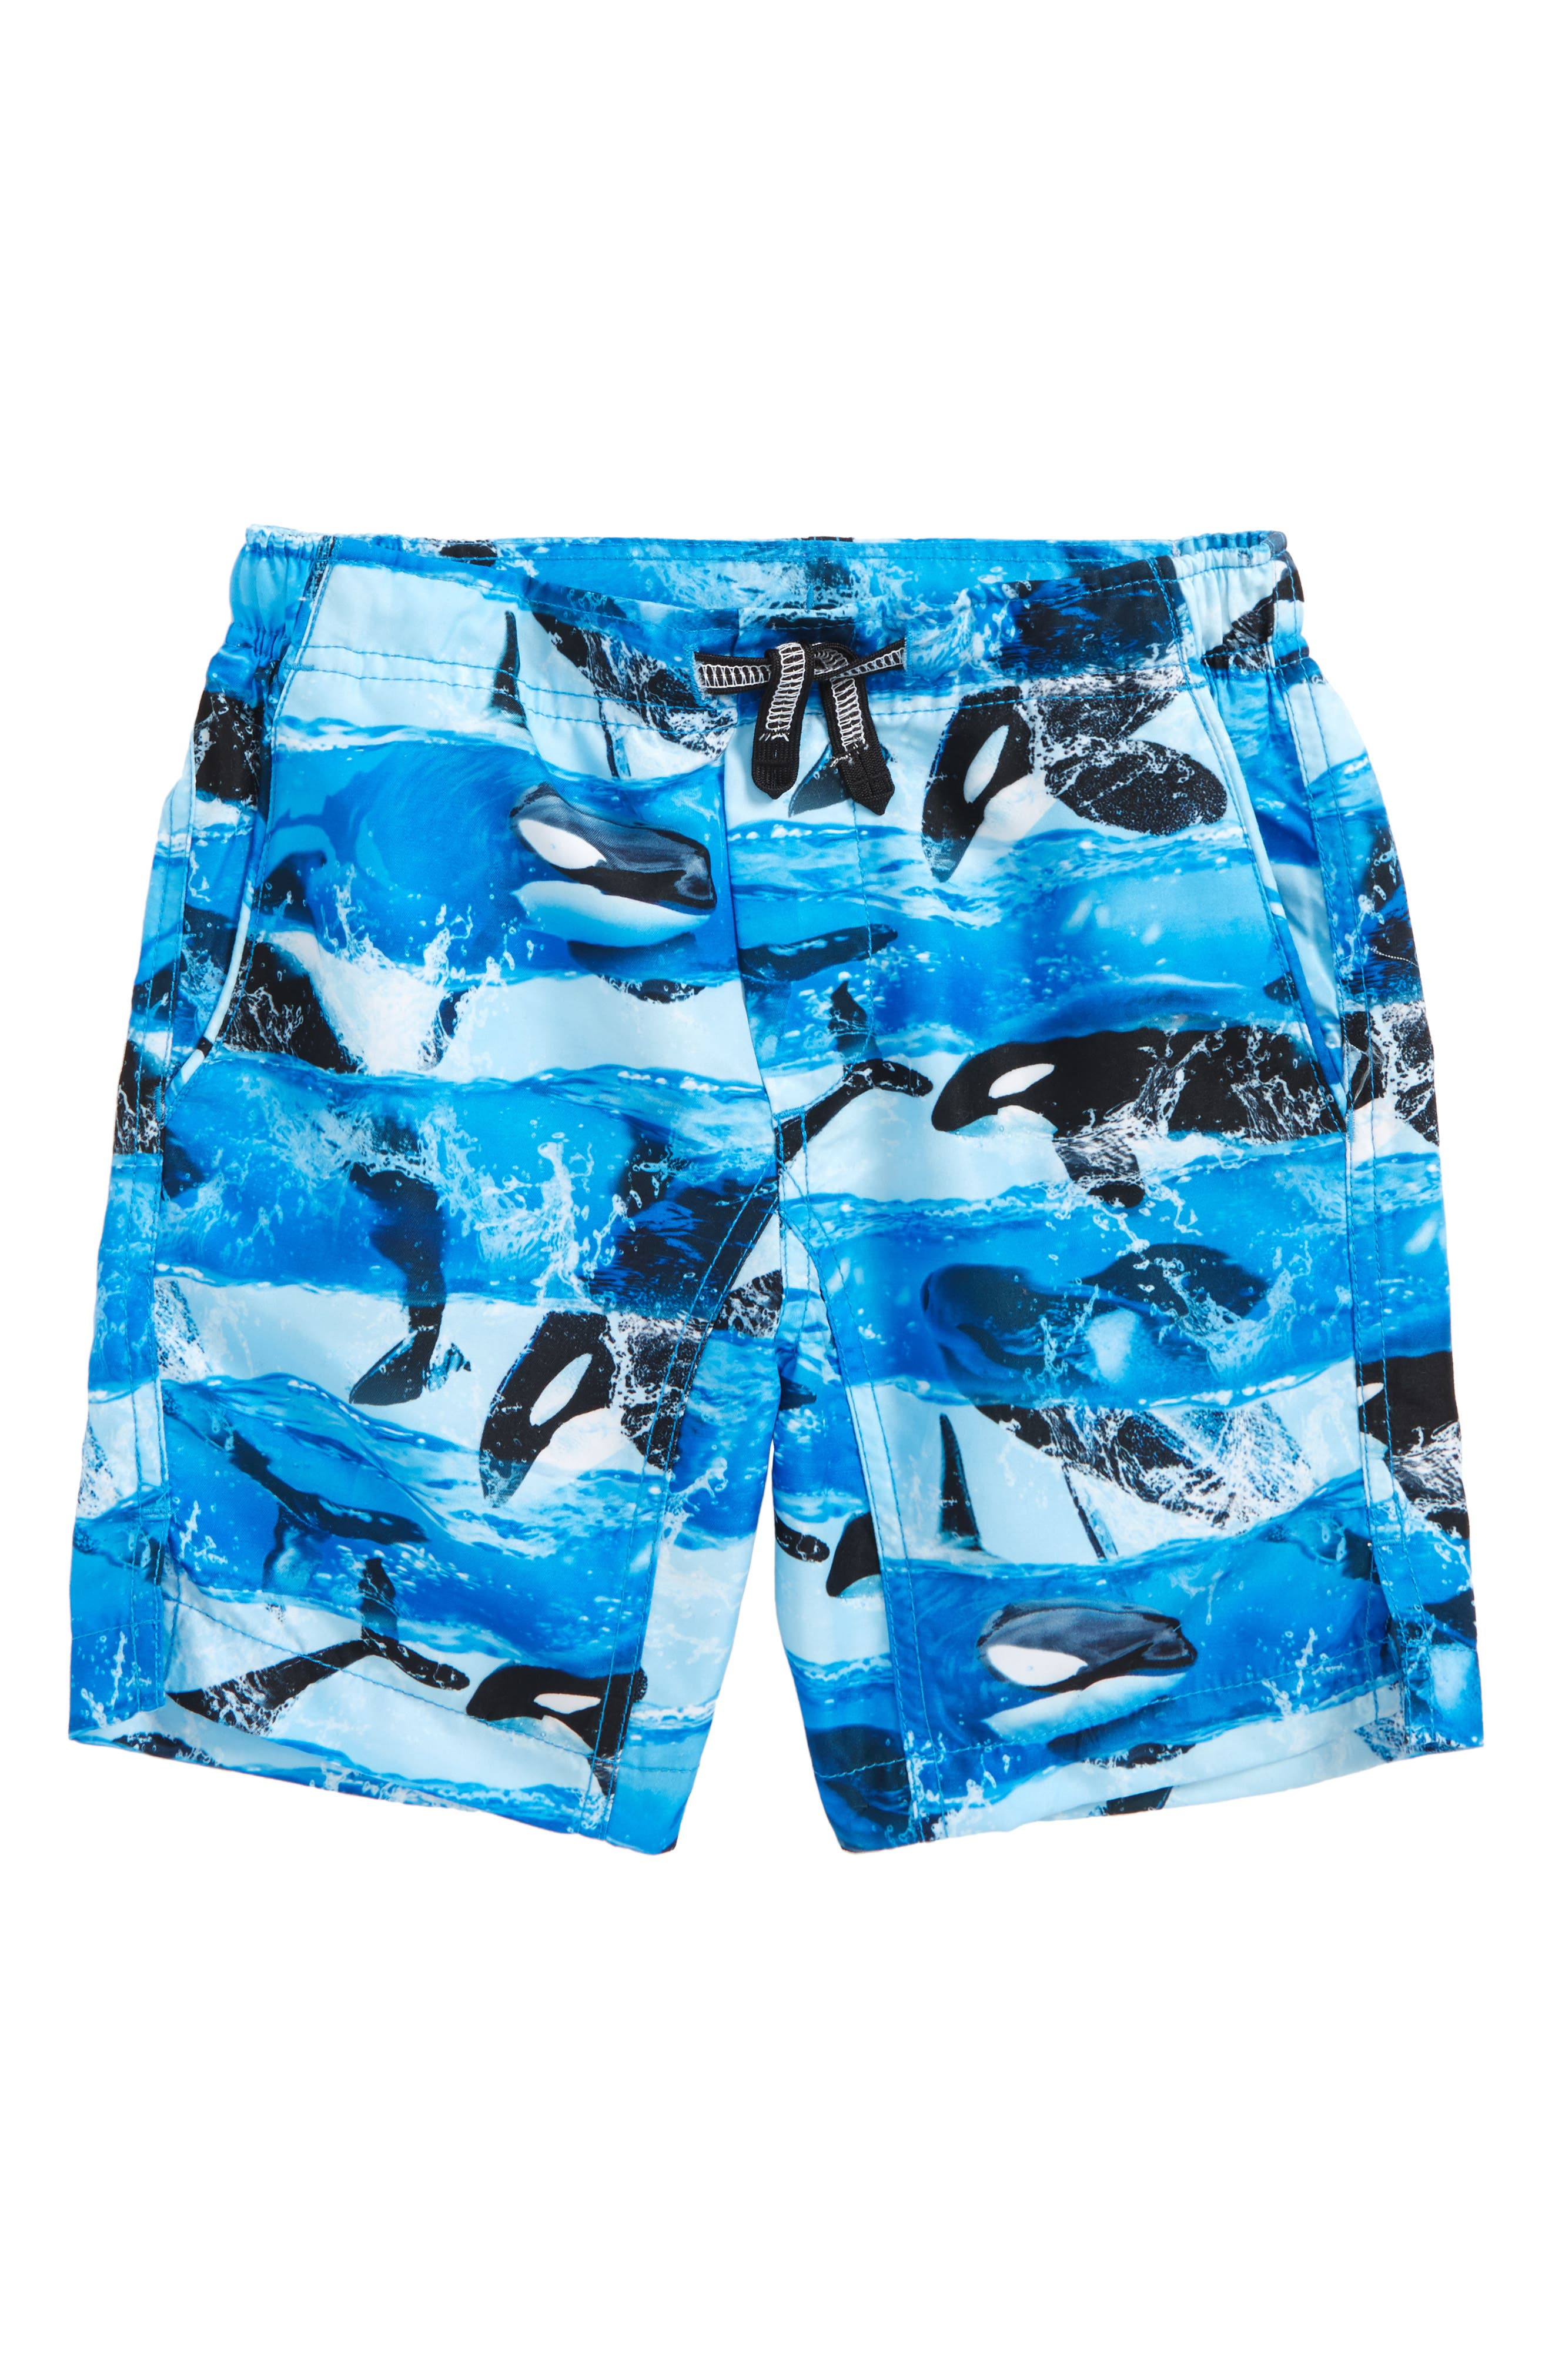 Nario Swim Trunks,                         Main,                         color, 001